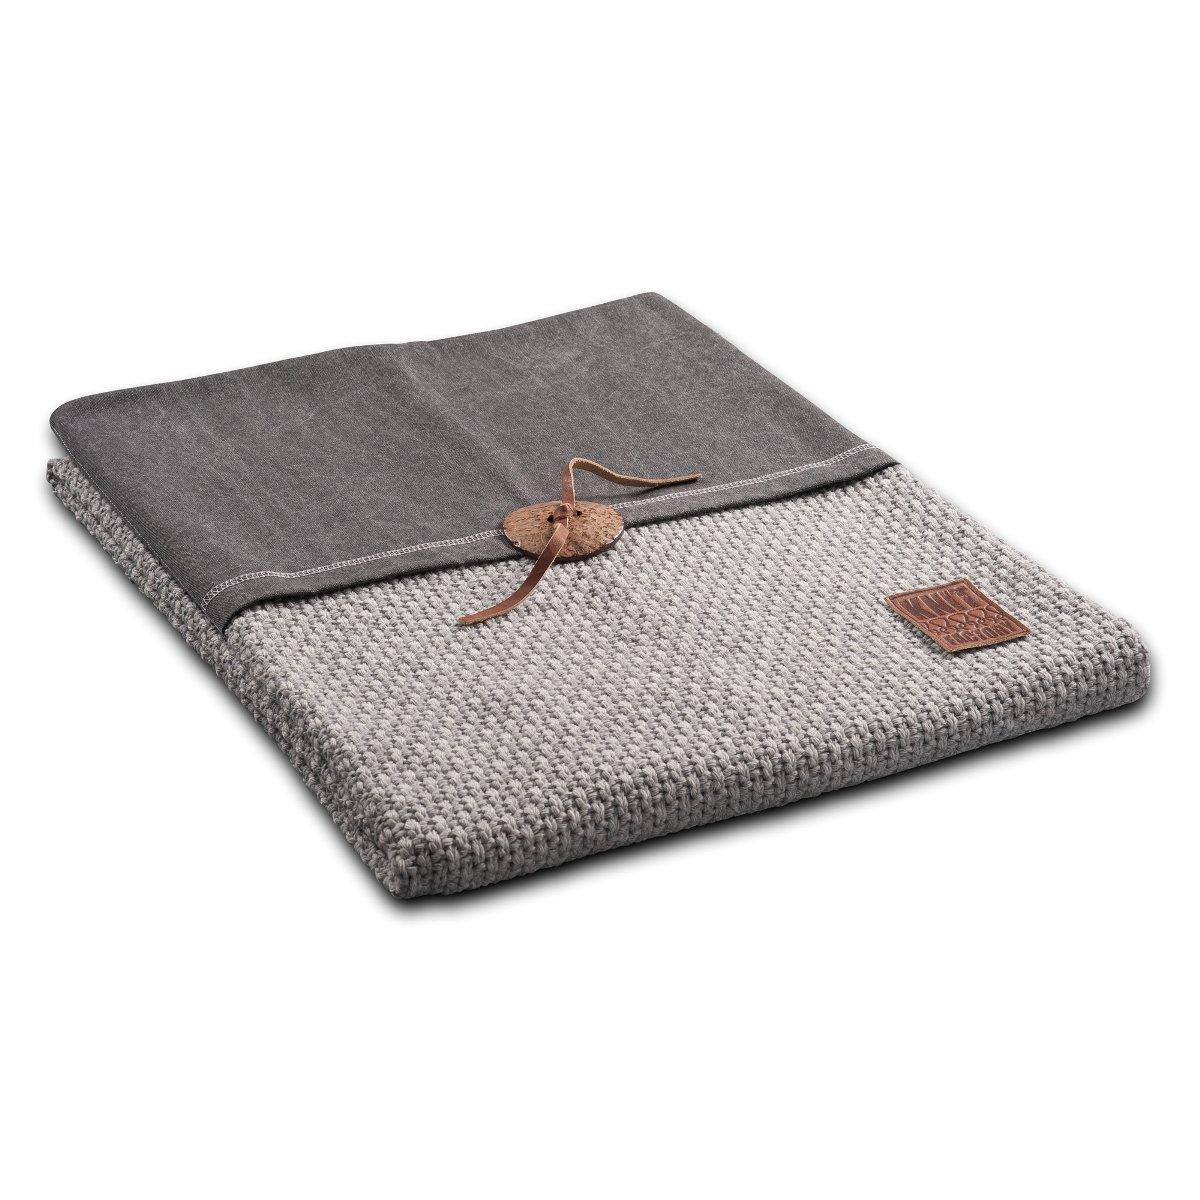 Knit Factory 111111 Strickdecke Plaid Reiskorn 130 x 160 cm, grau